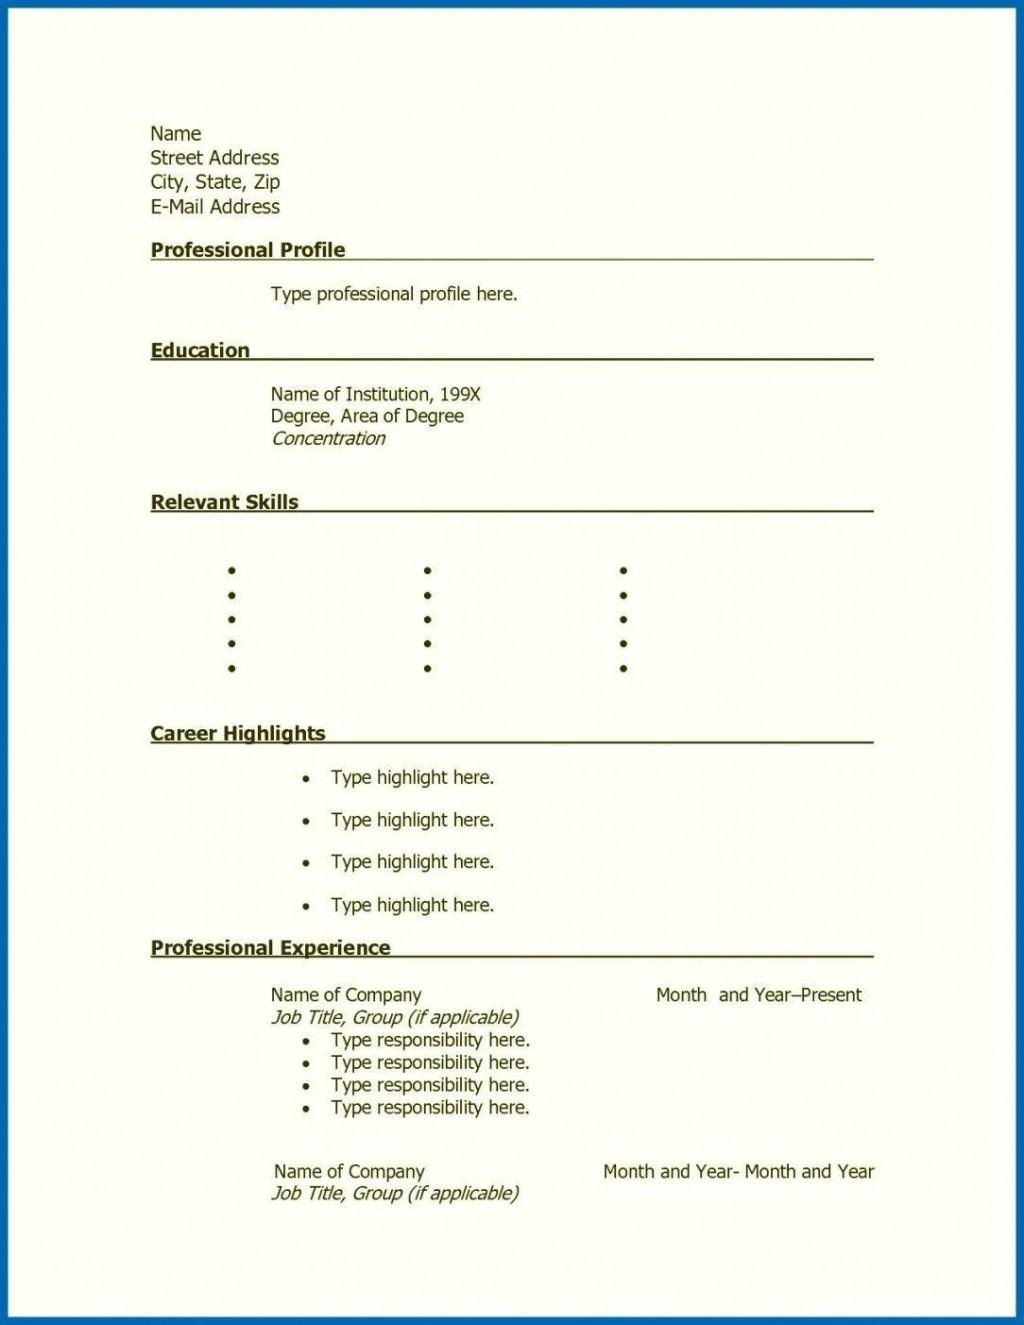 001 Stunning Free Printable Resume Template Blank Sample  FillLarge